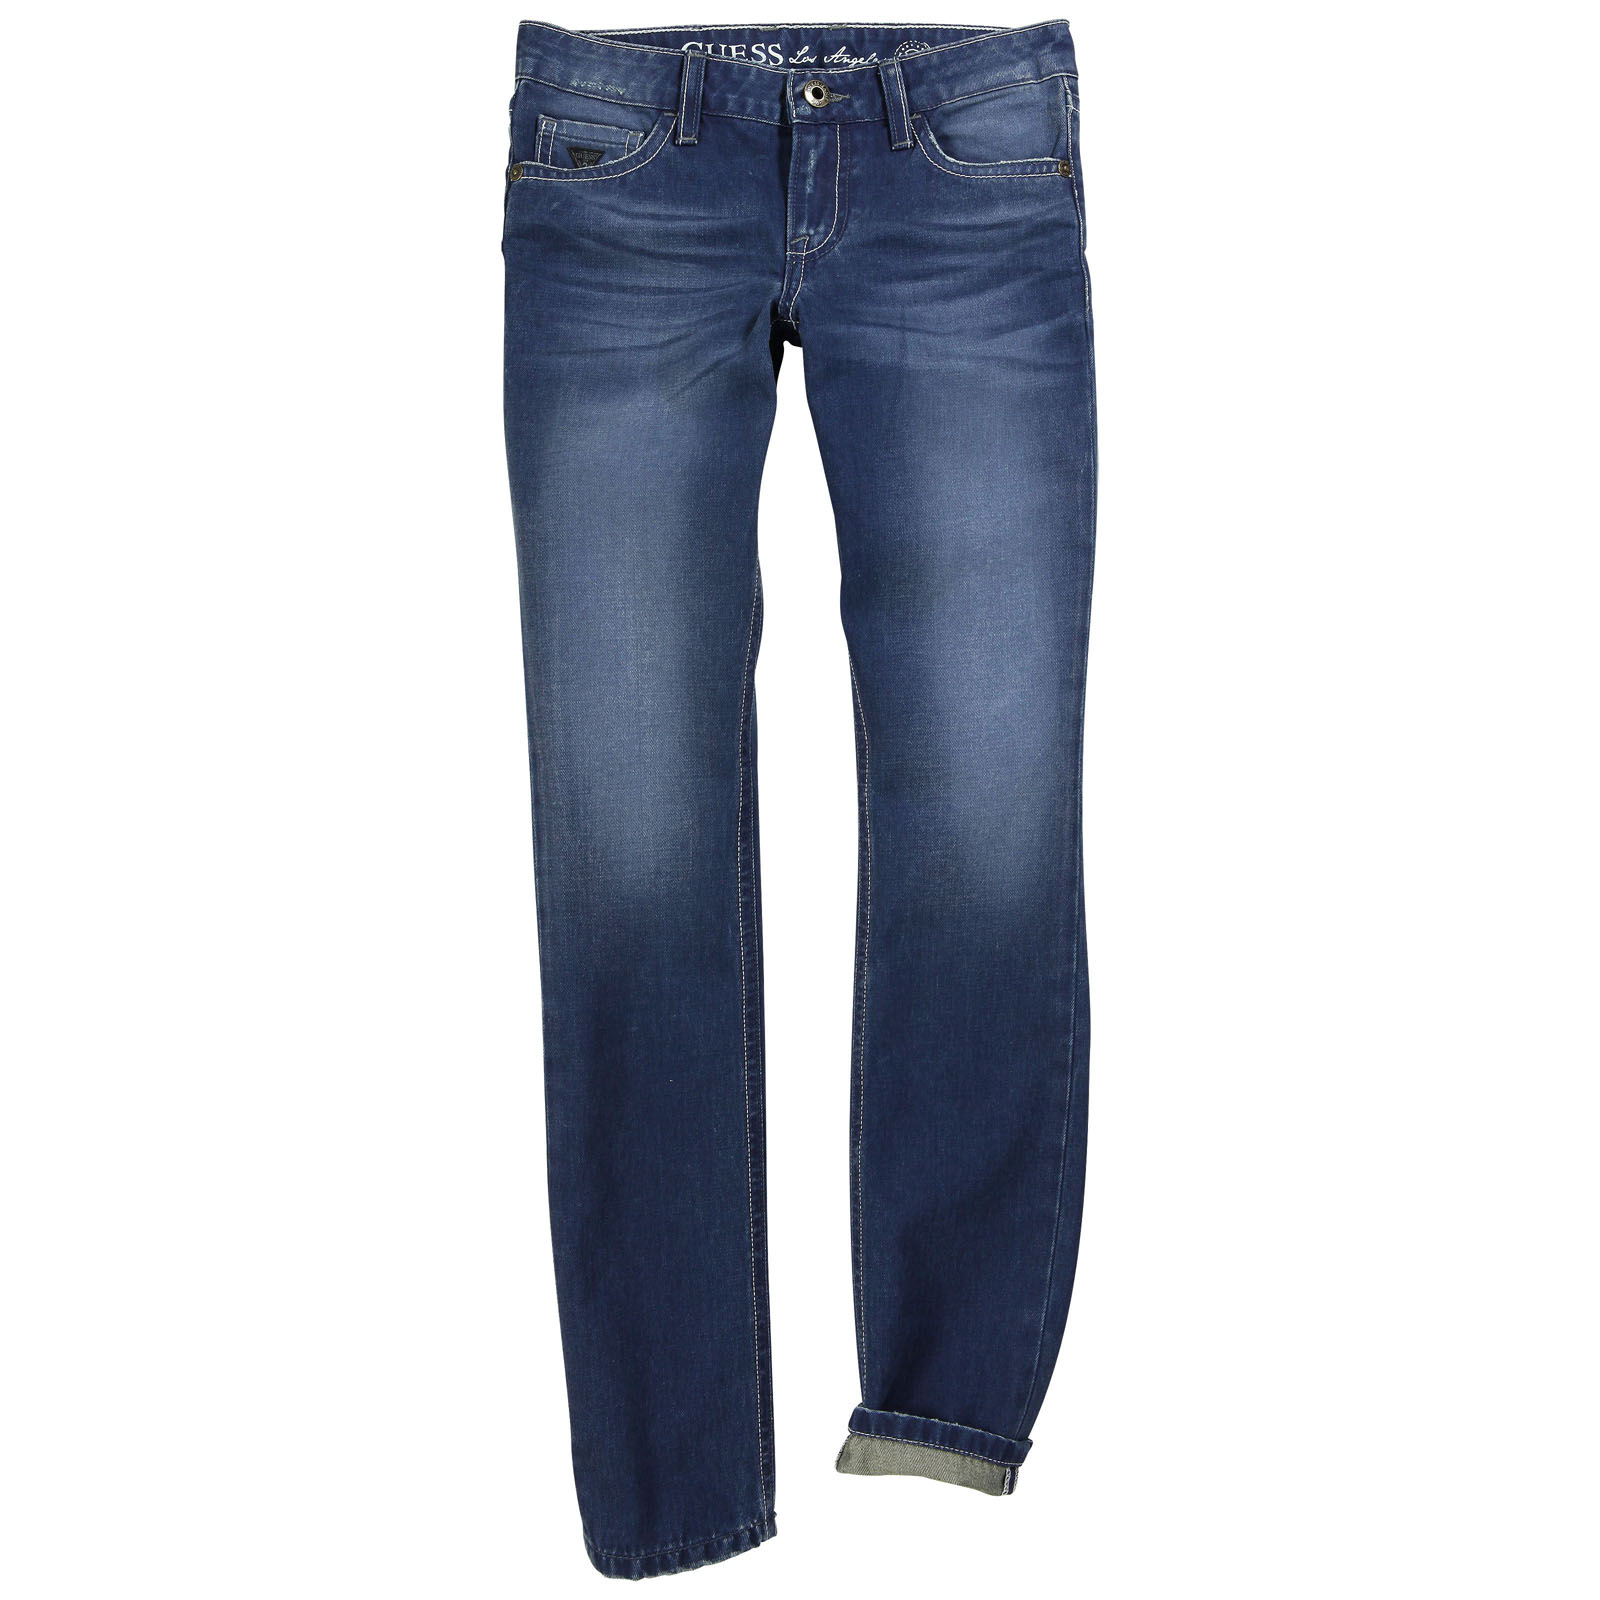 Blue Jeans 17